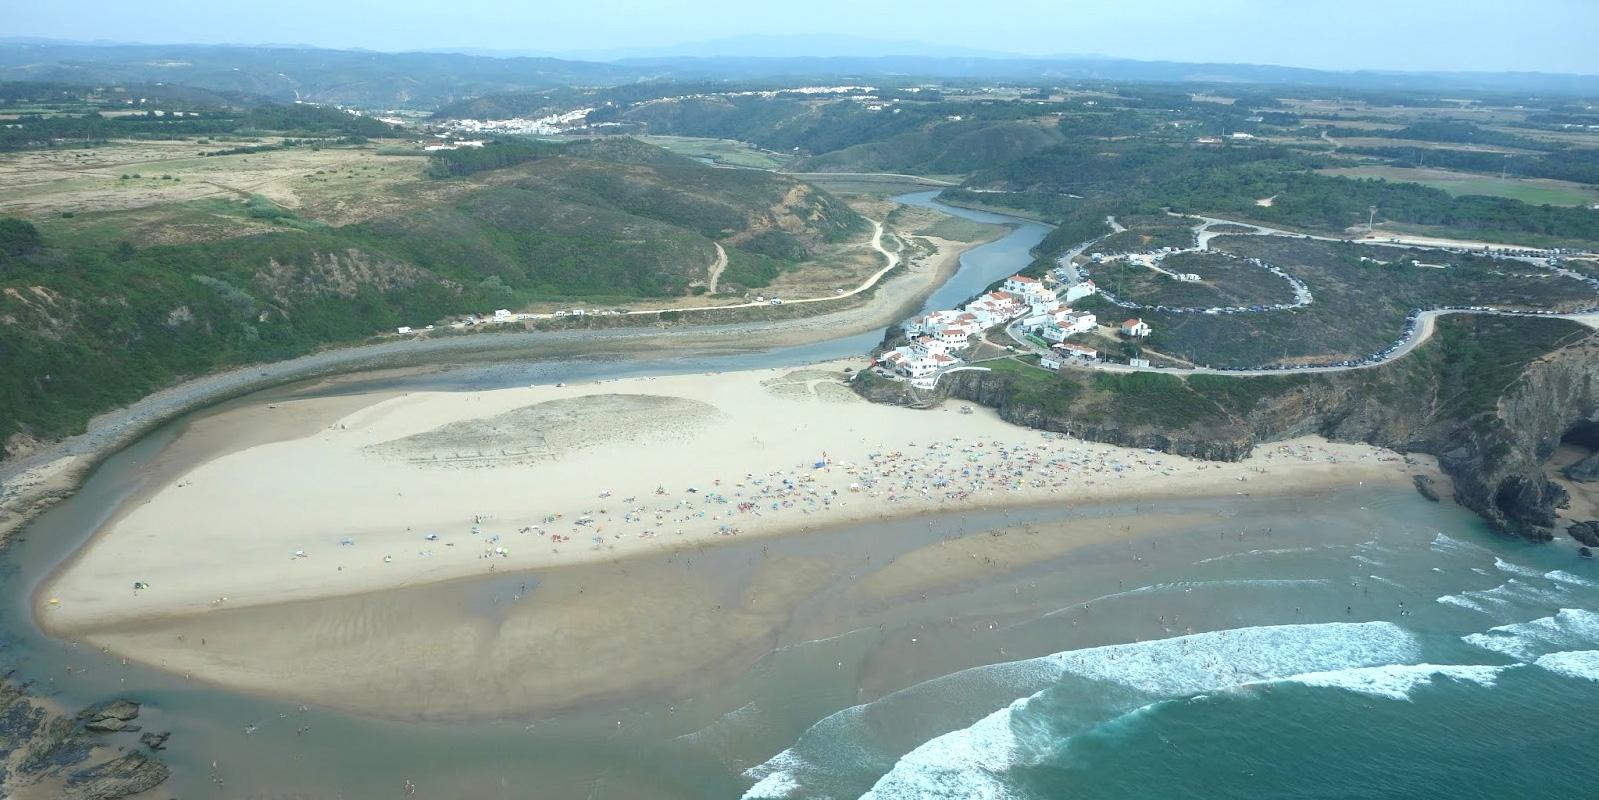 Praia de odeceixe mar algarve portal